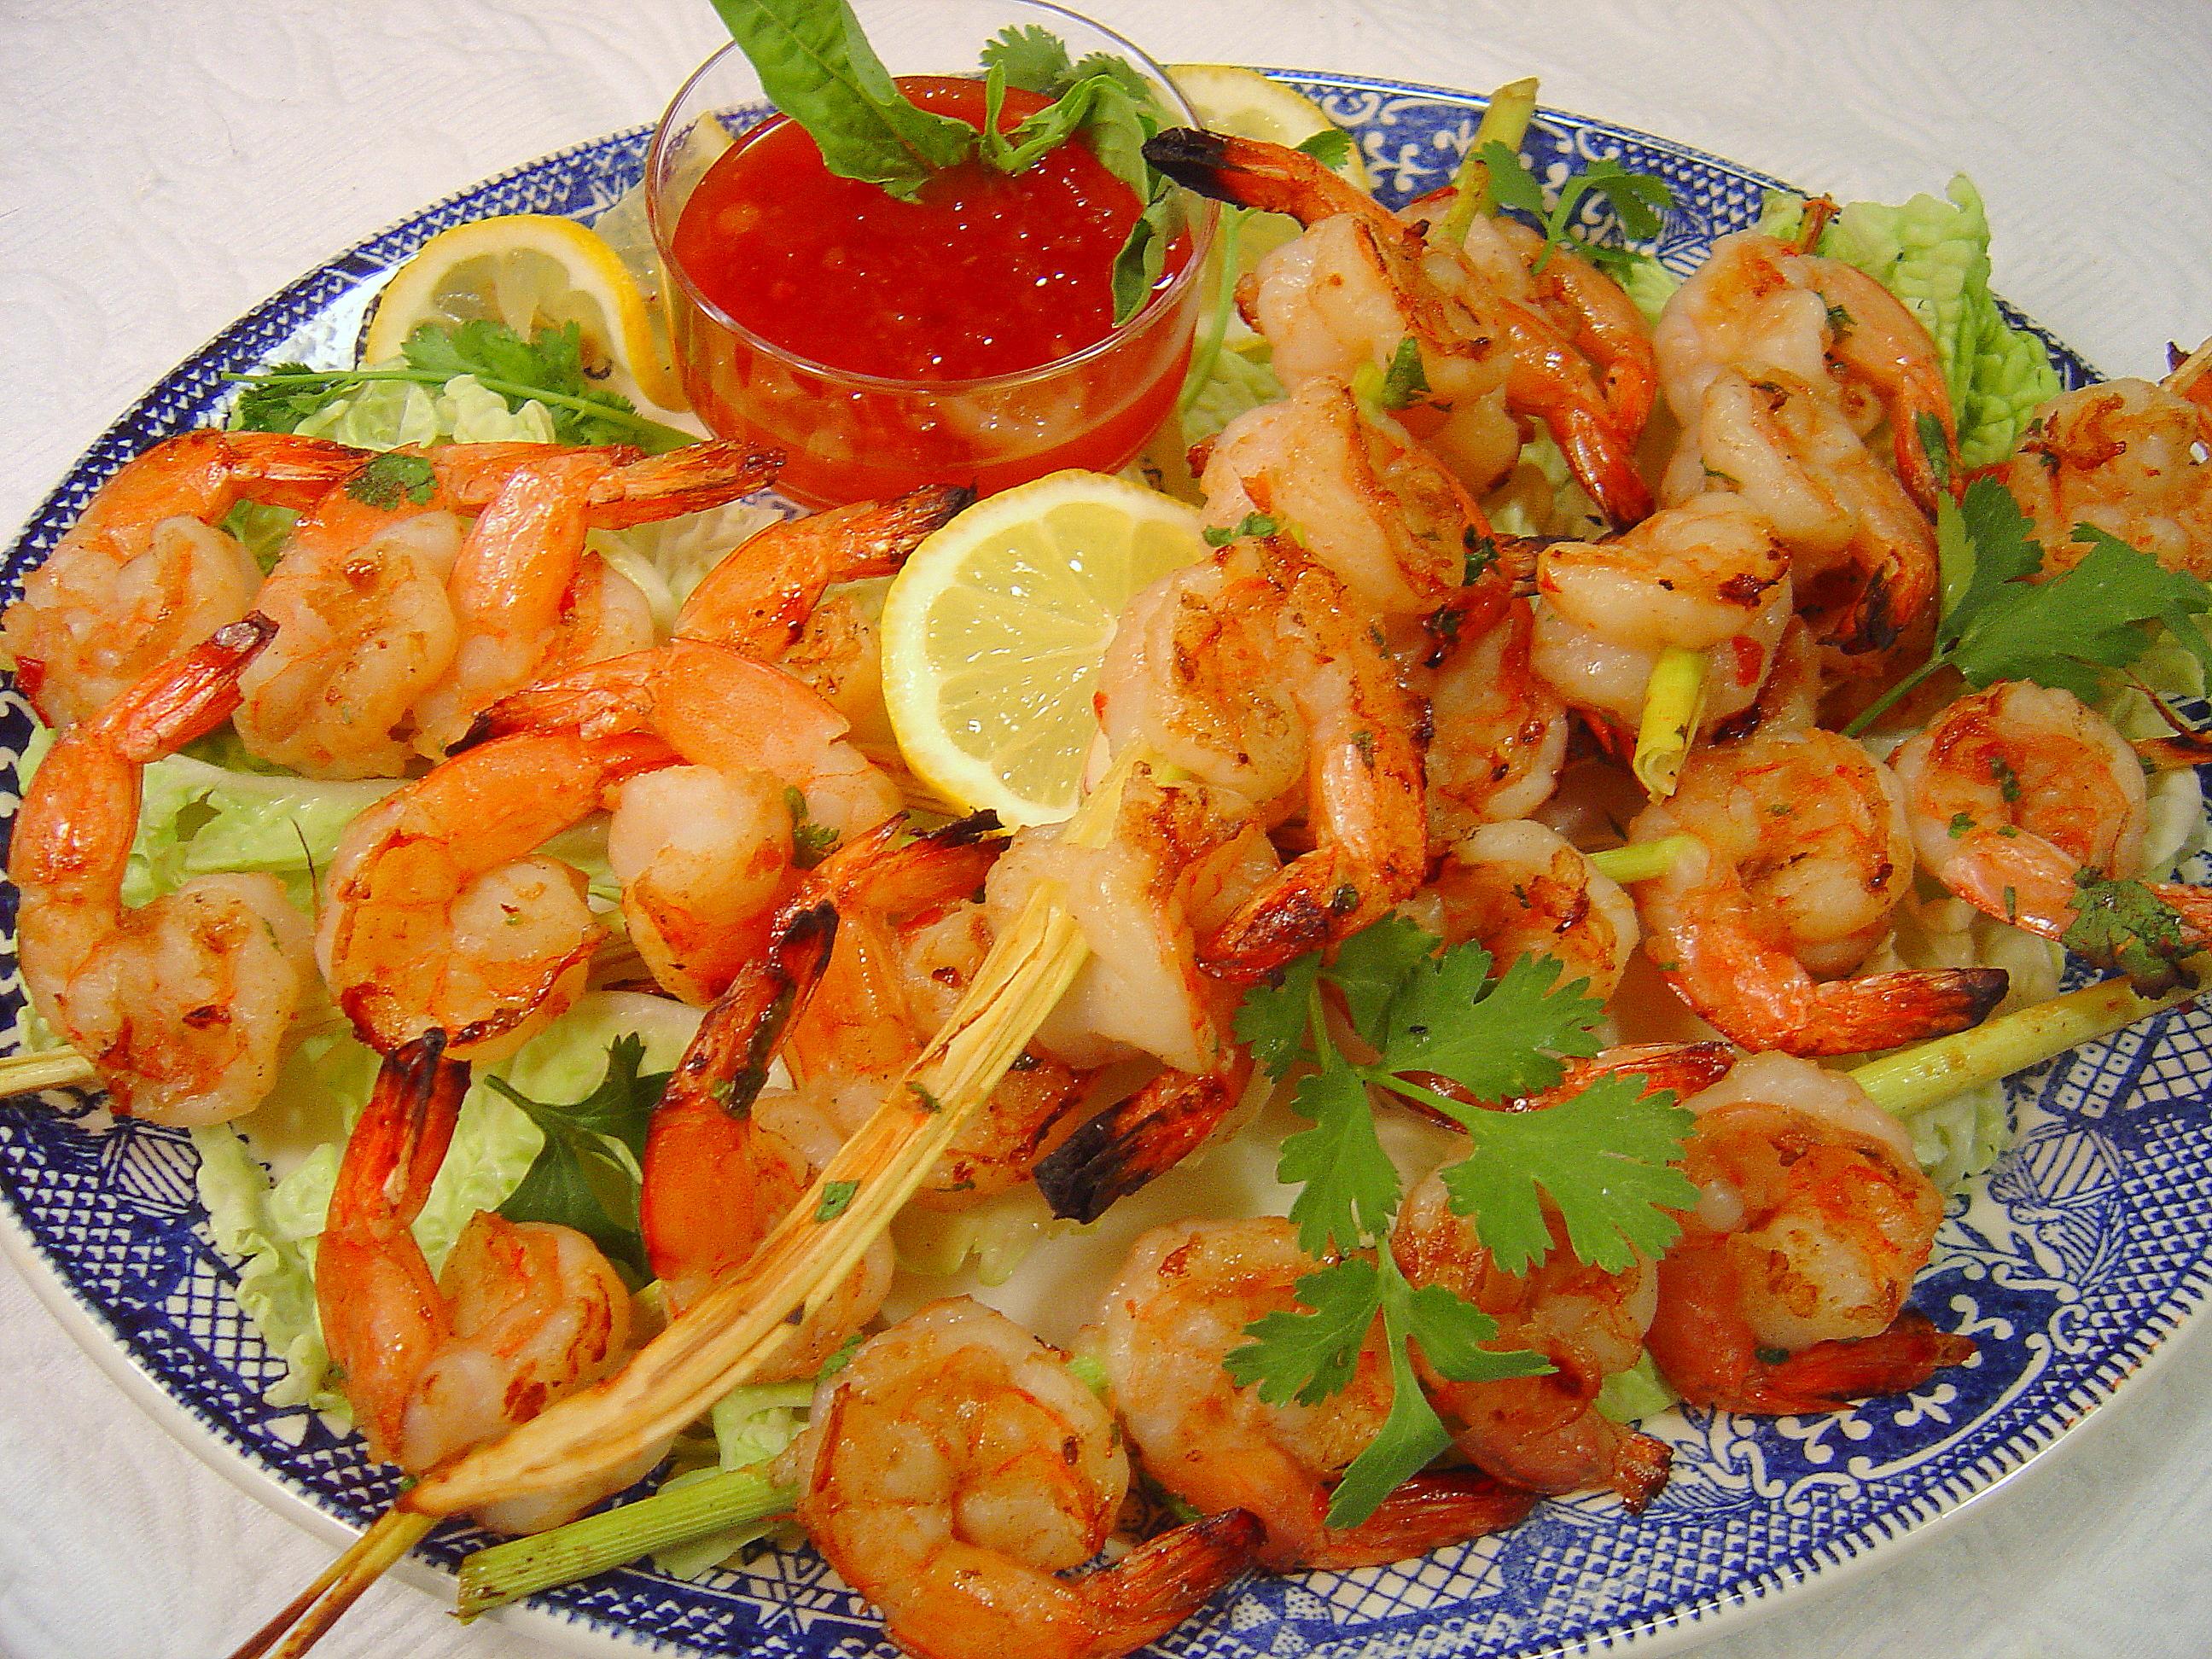 Lemongrass Grilled Shrimp | A Palatable Pastime